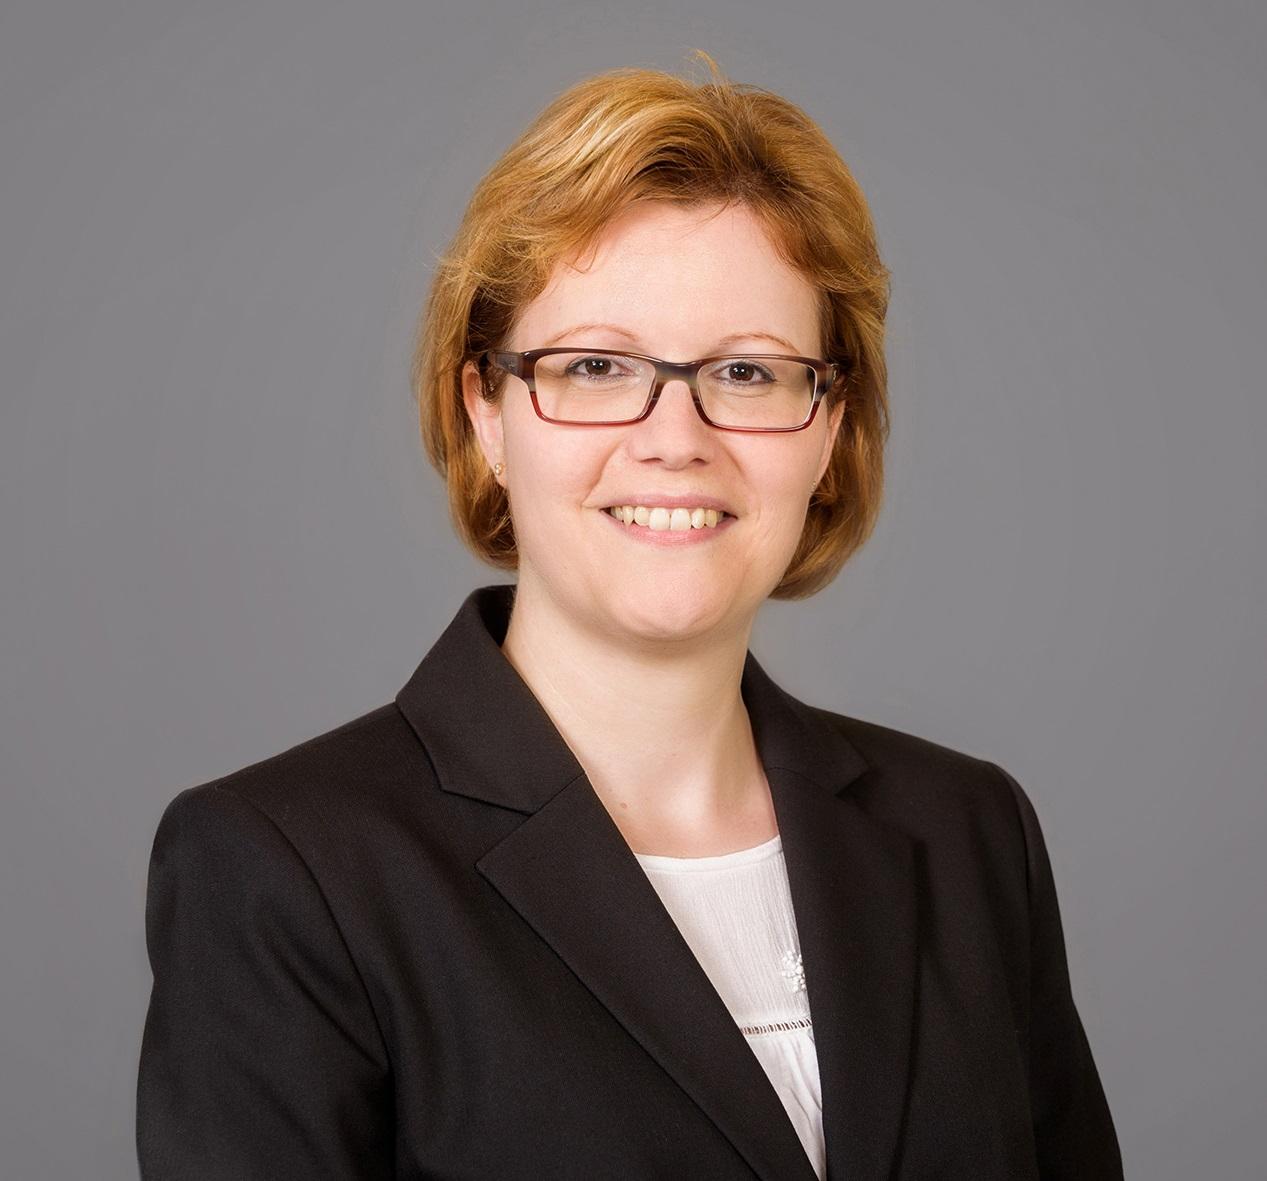 Karin Helm